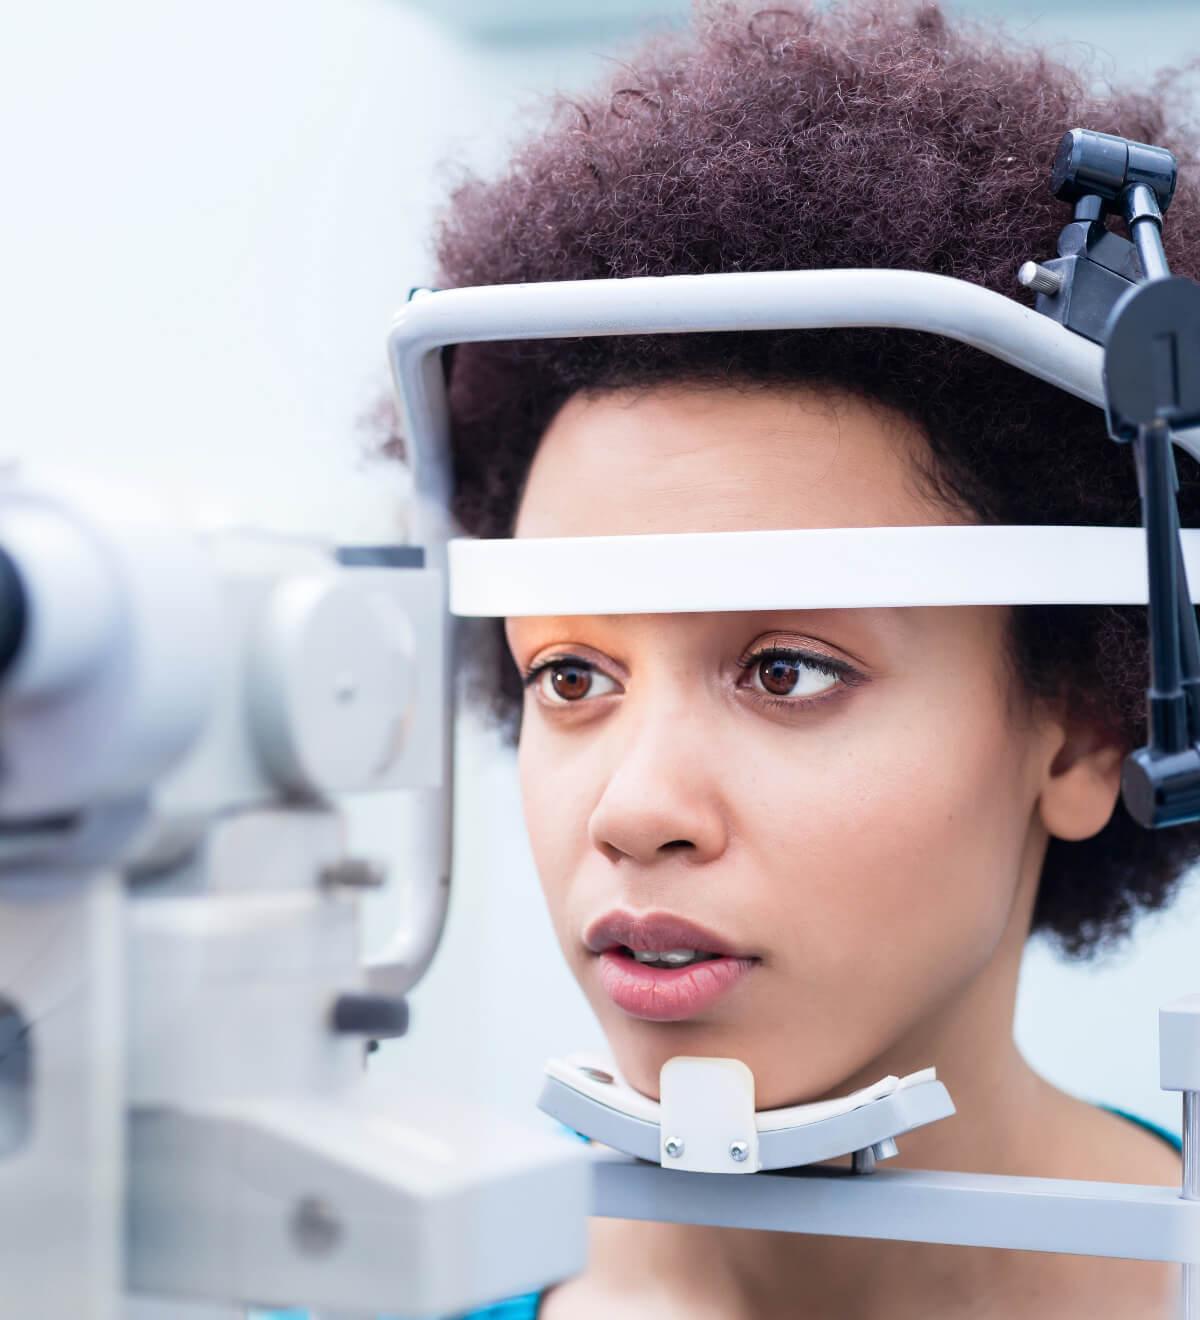 Optician conducting an eye test